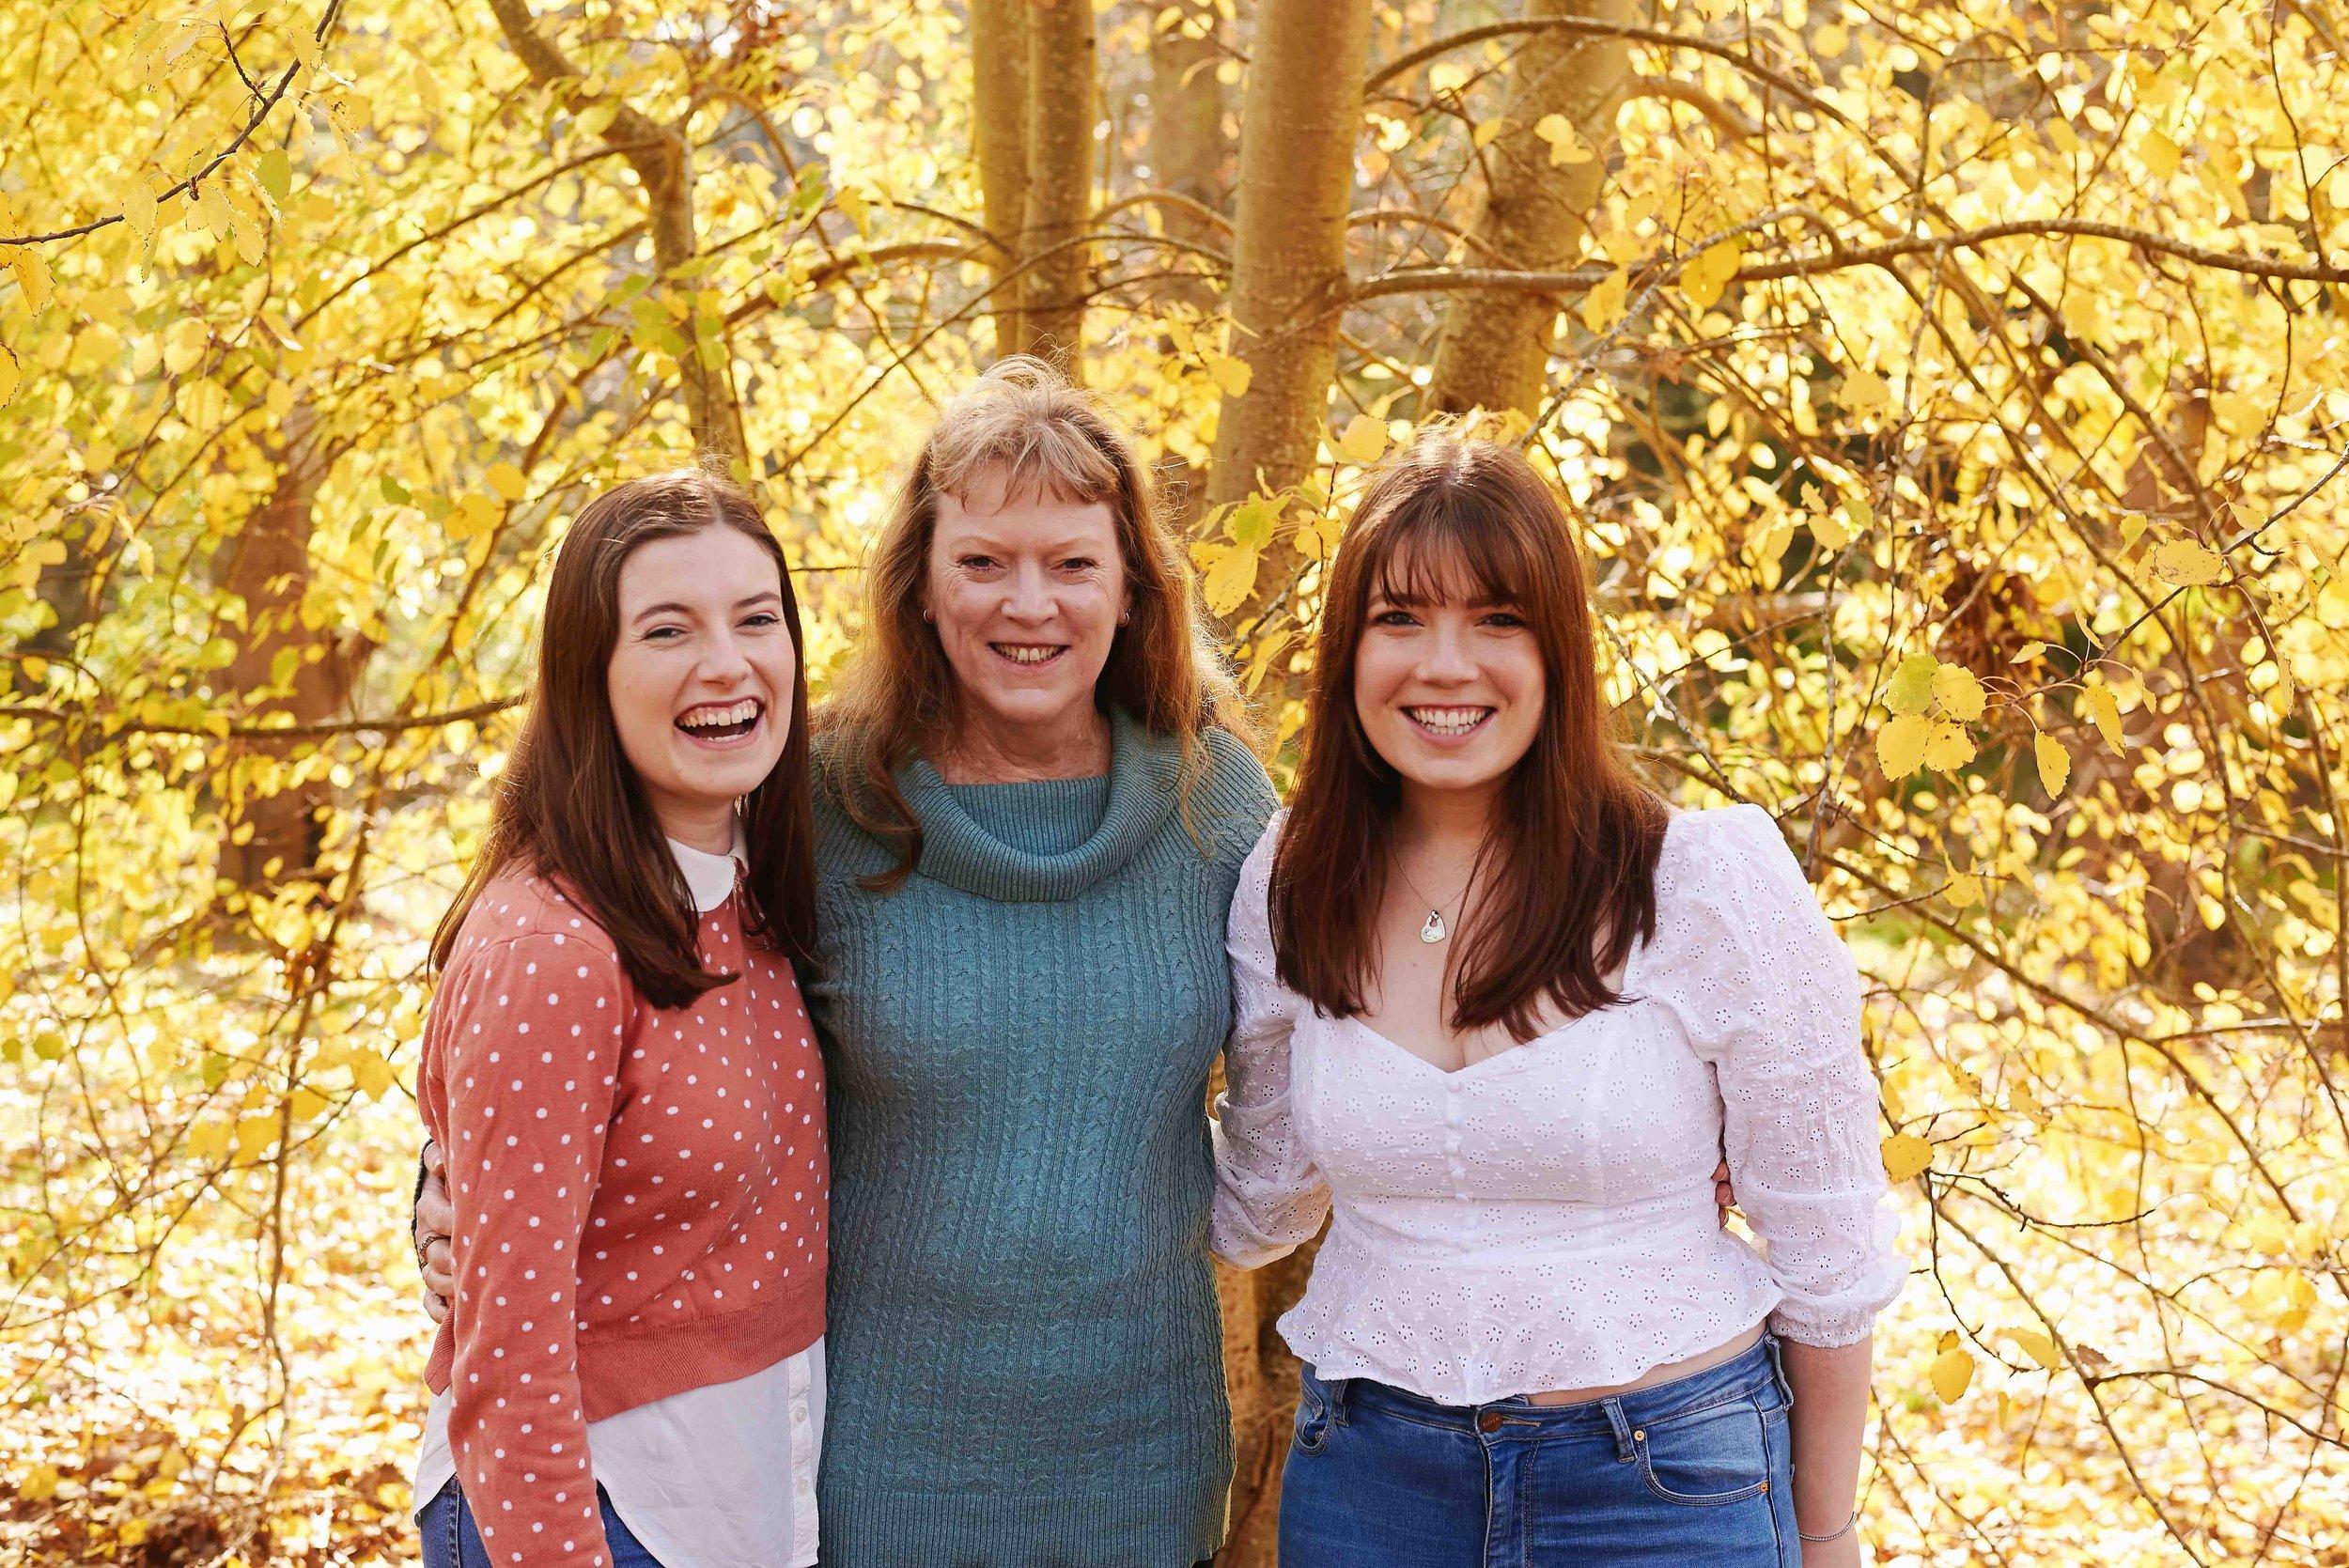 mornington-peninsula-family-photographer-marissa-jade-photography-families-red-hill-10.jpg